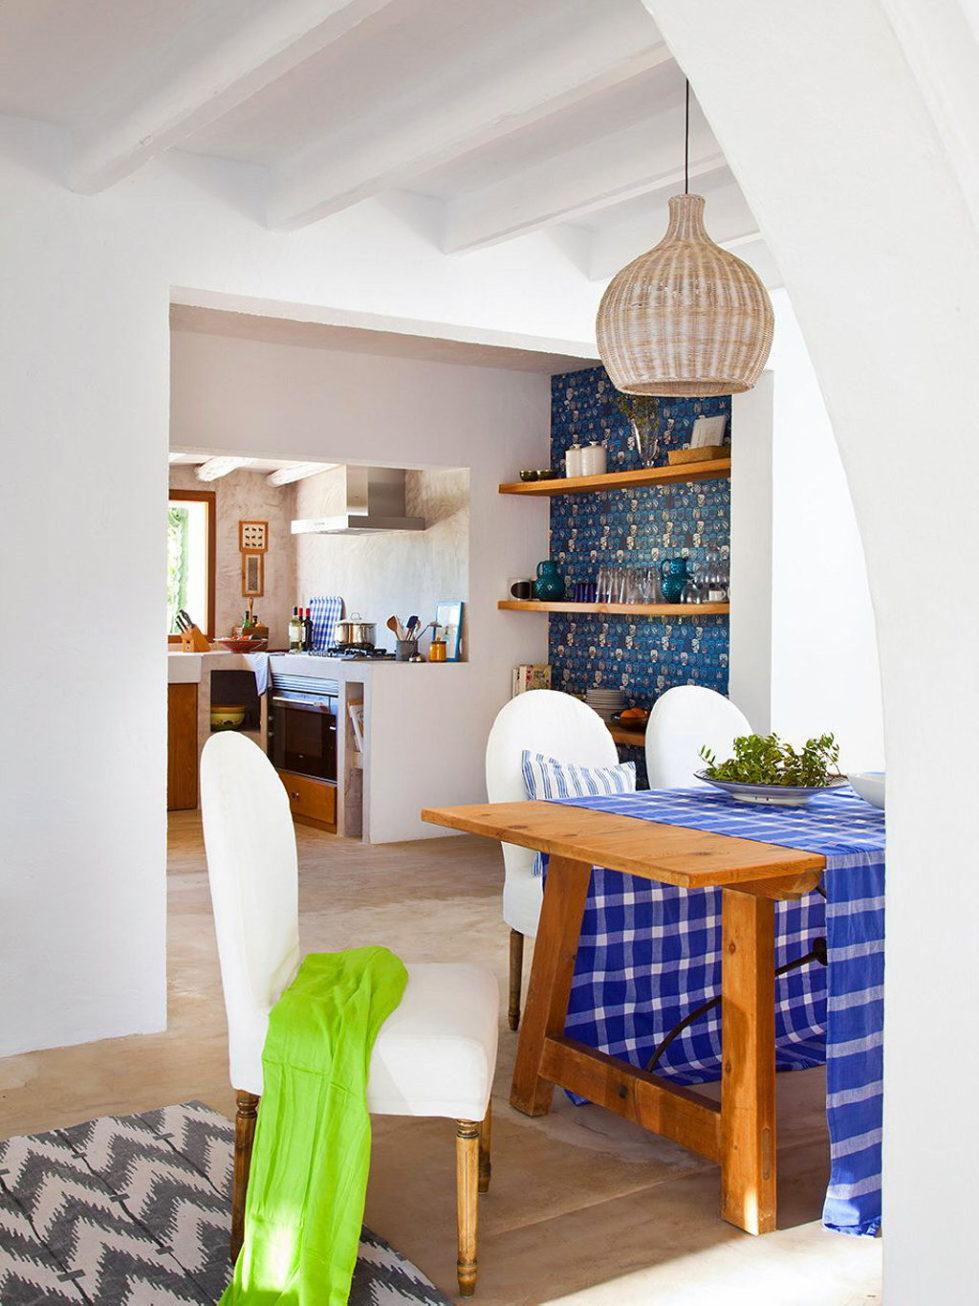 The House Of Mediterranean Style, Ibitza 7